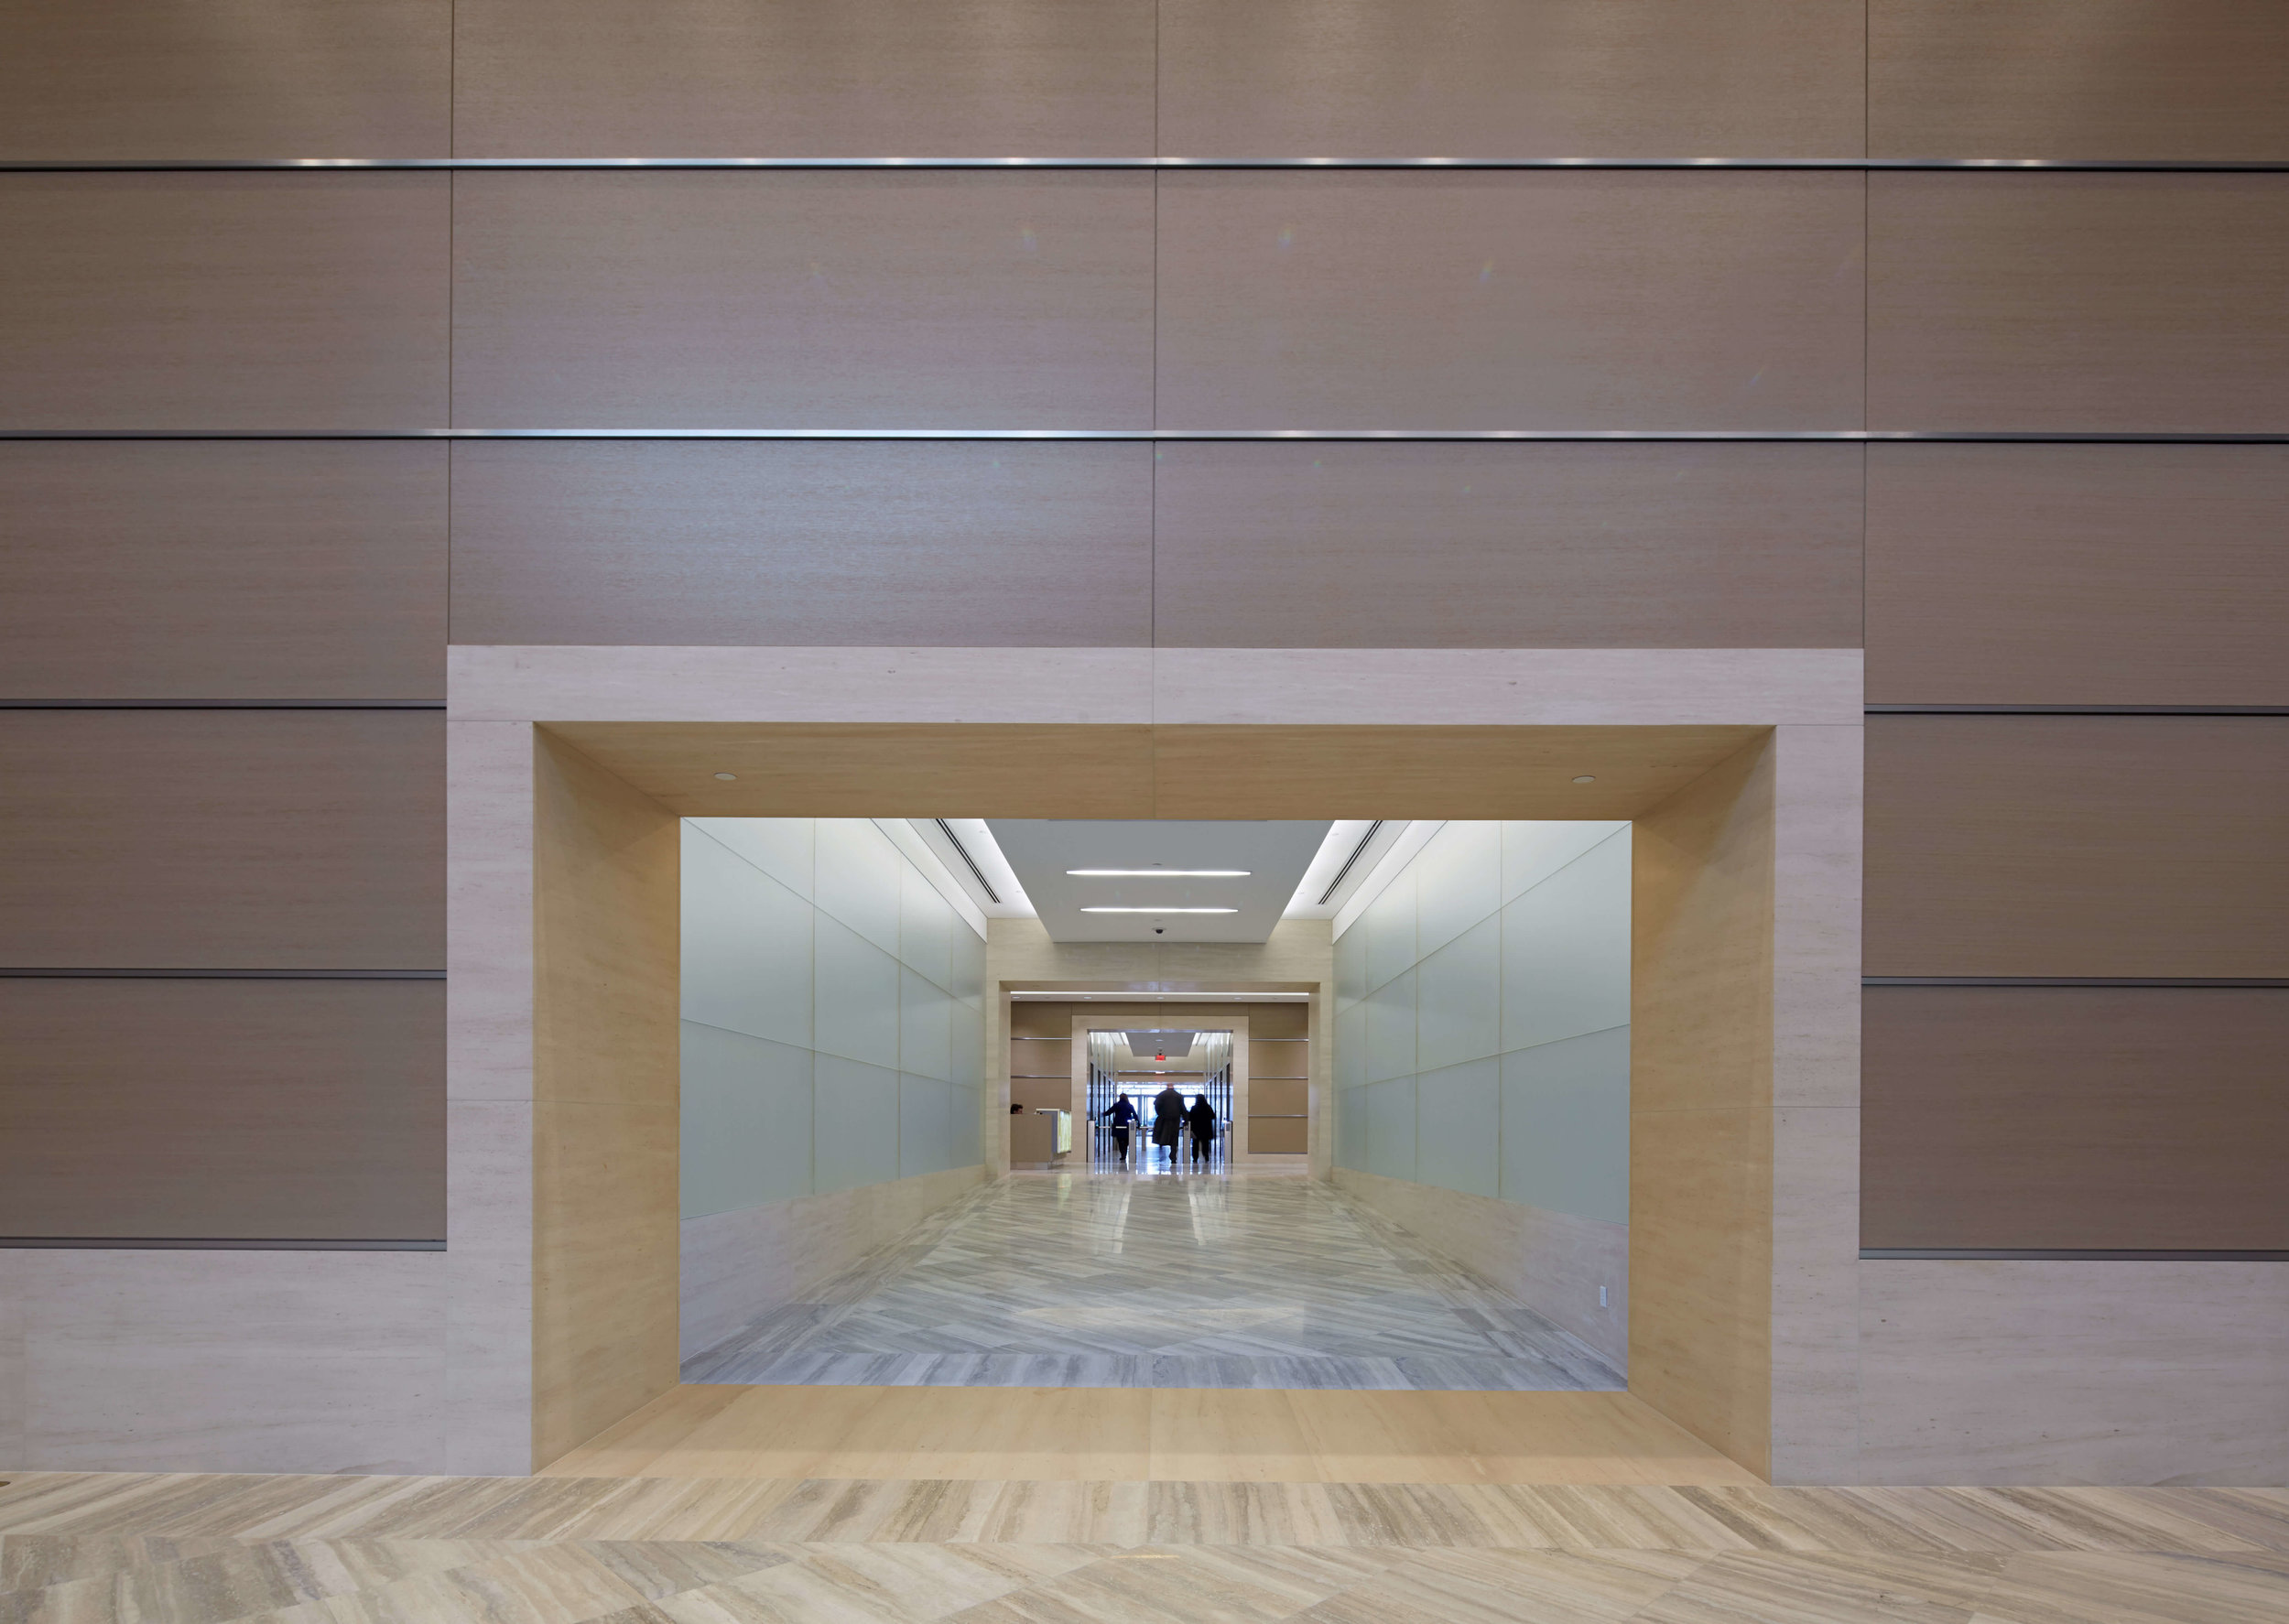 Waterfront-Interior-Lobby-2.jpg